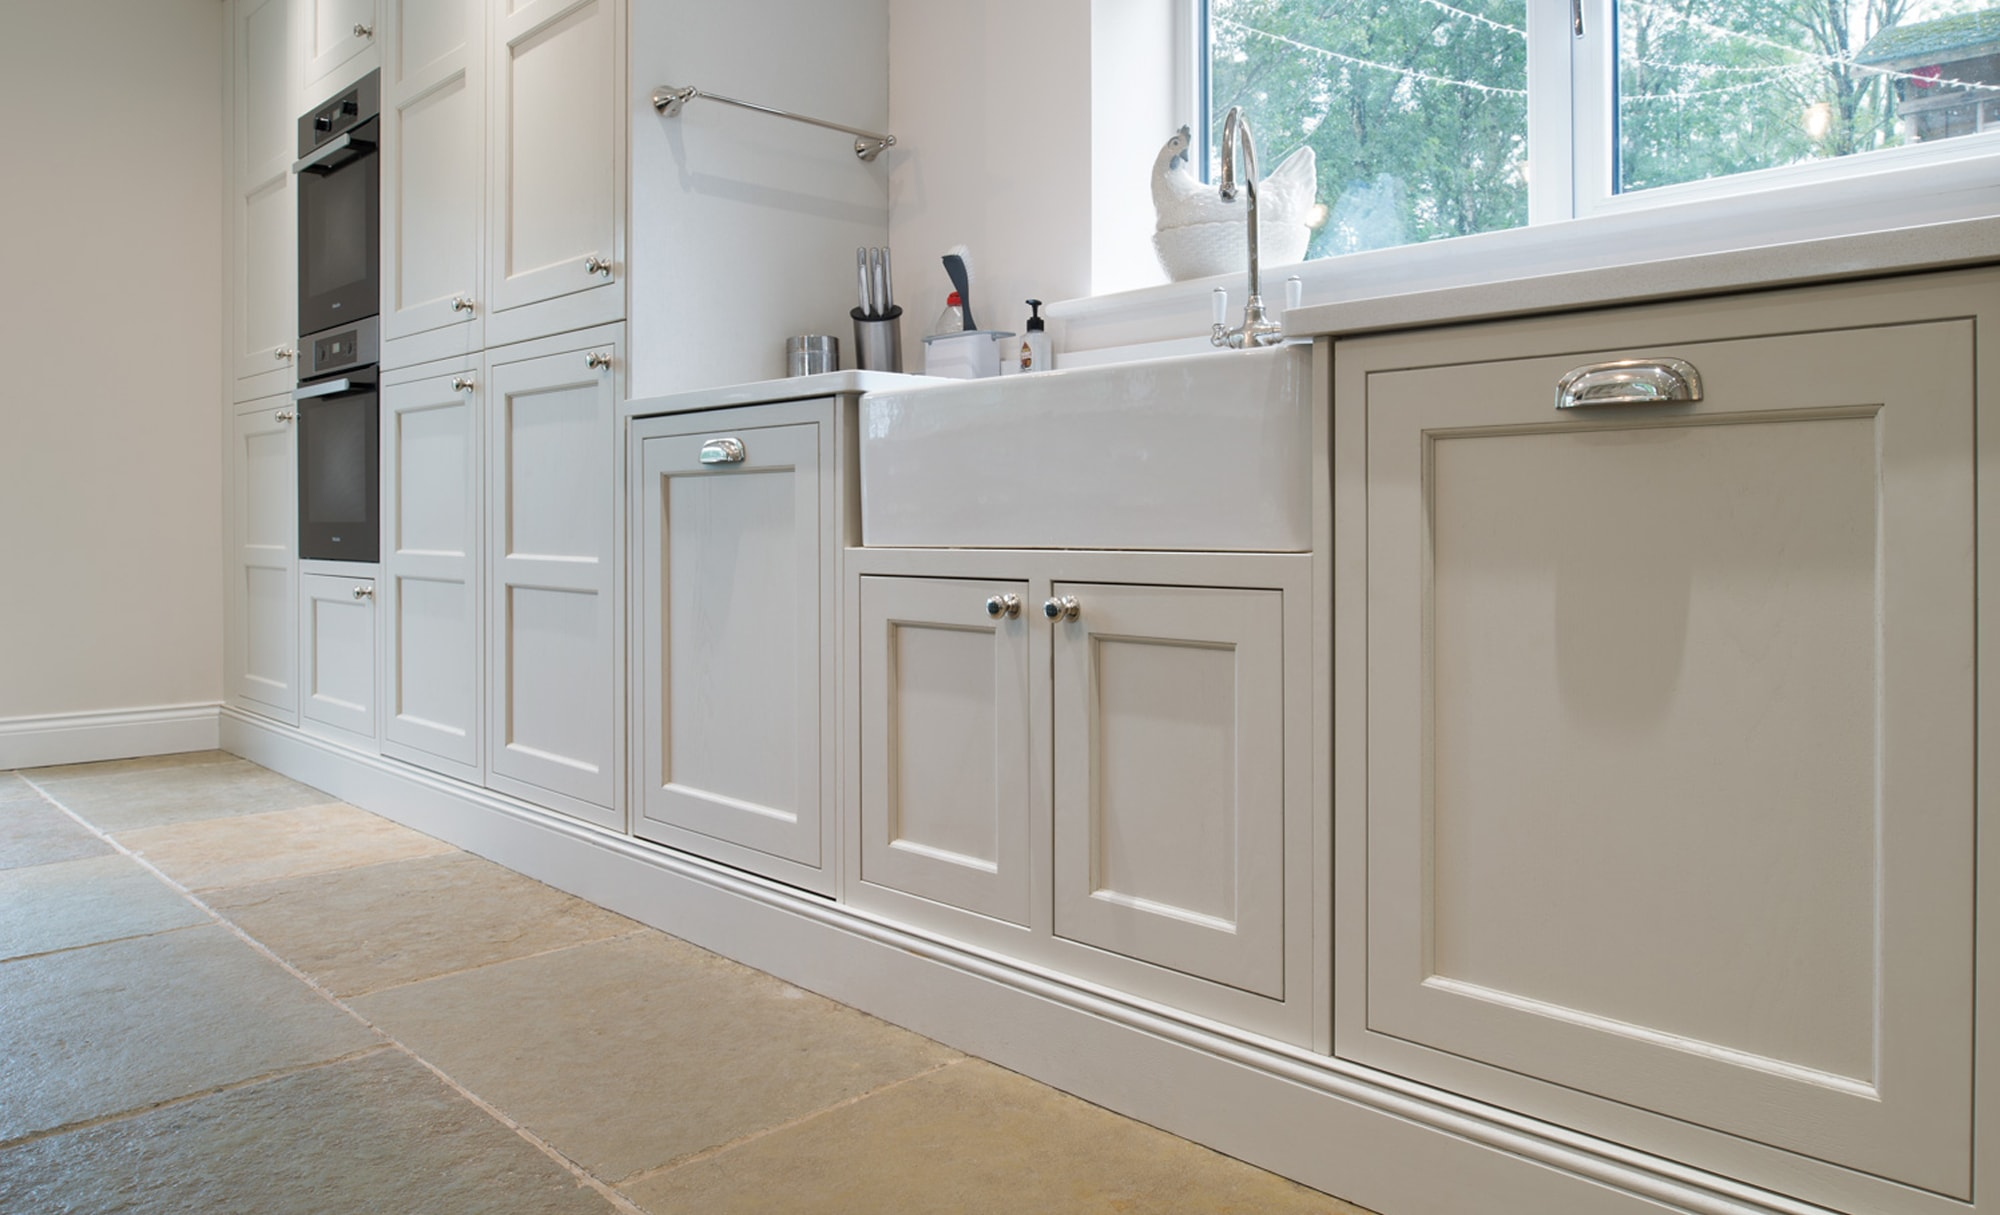 Maelstrom Belgravia Shell & Deep Forest Kitchen Floor